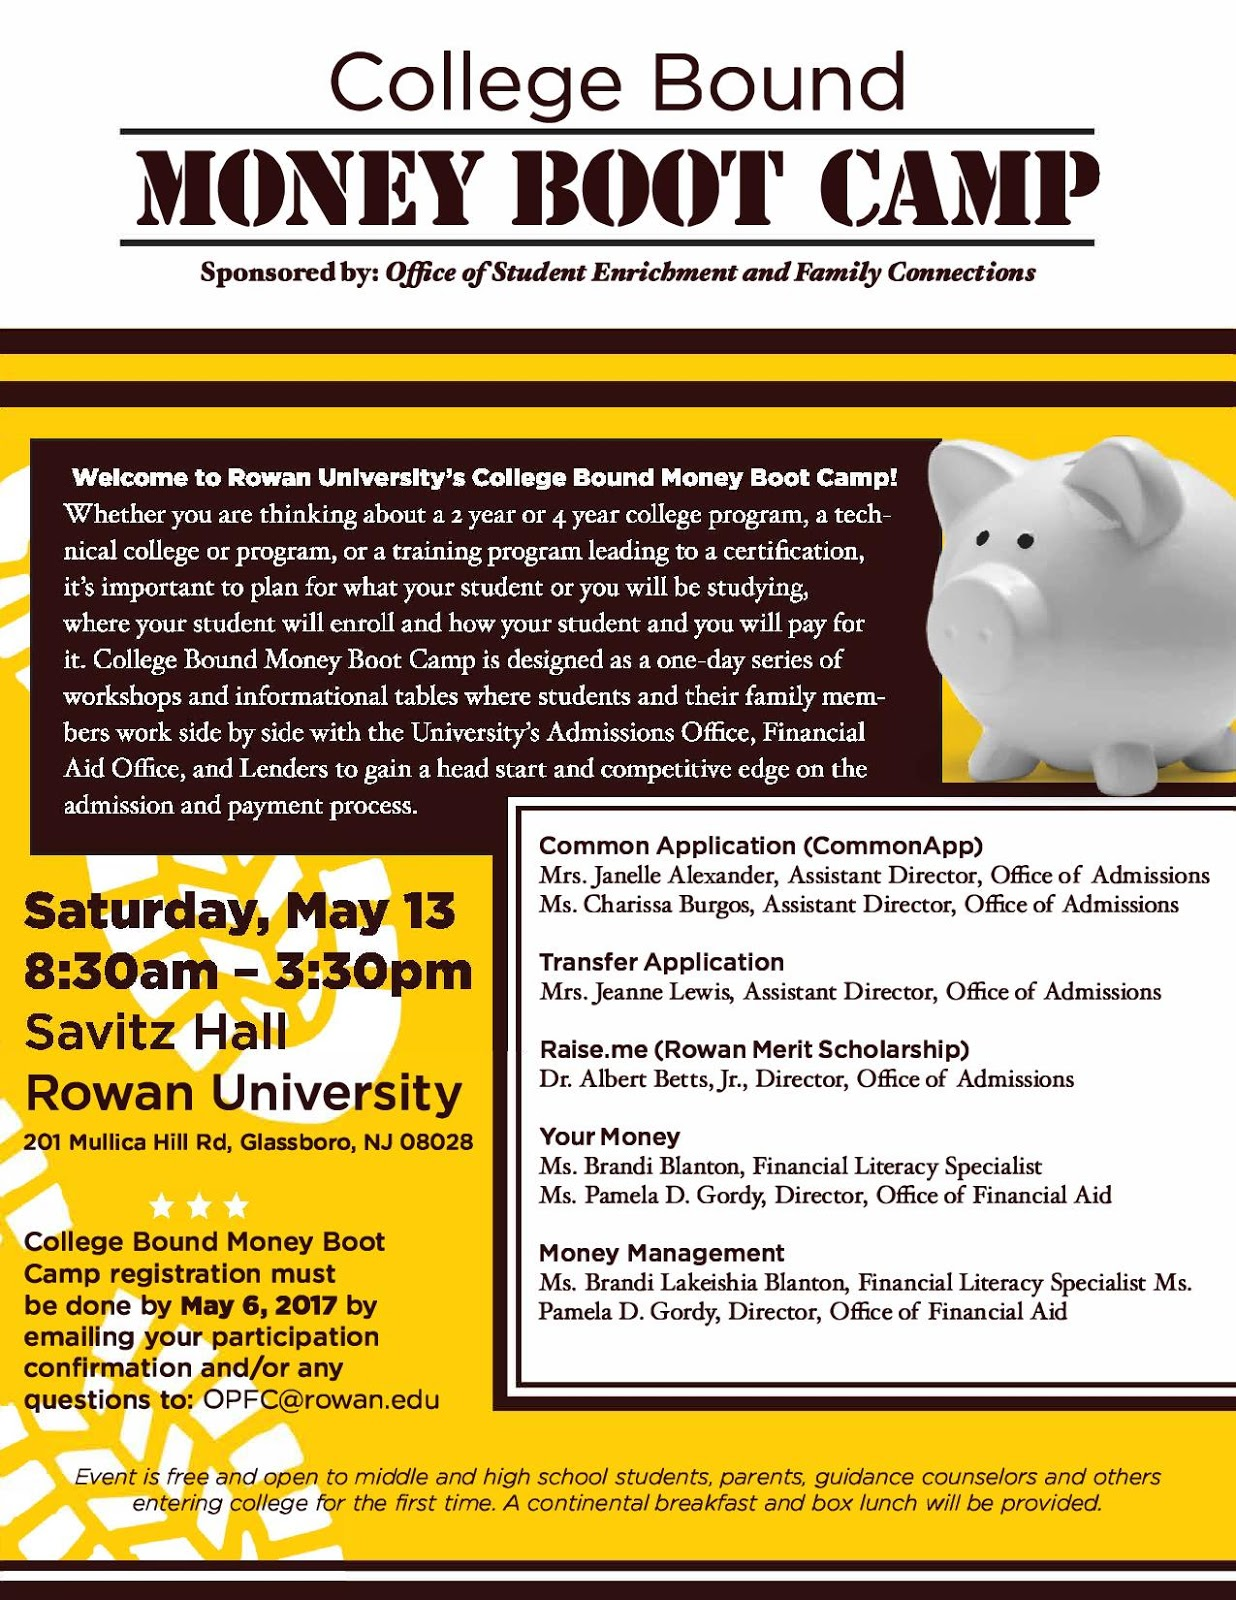 Woodbridge High School Guidance Department : Register for the Free Money Boot Camp at Rowan ...